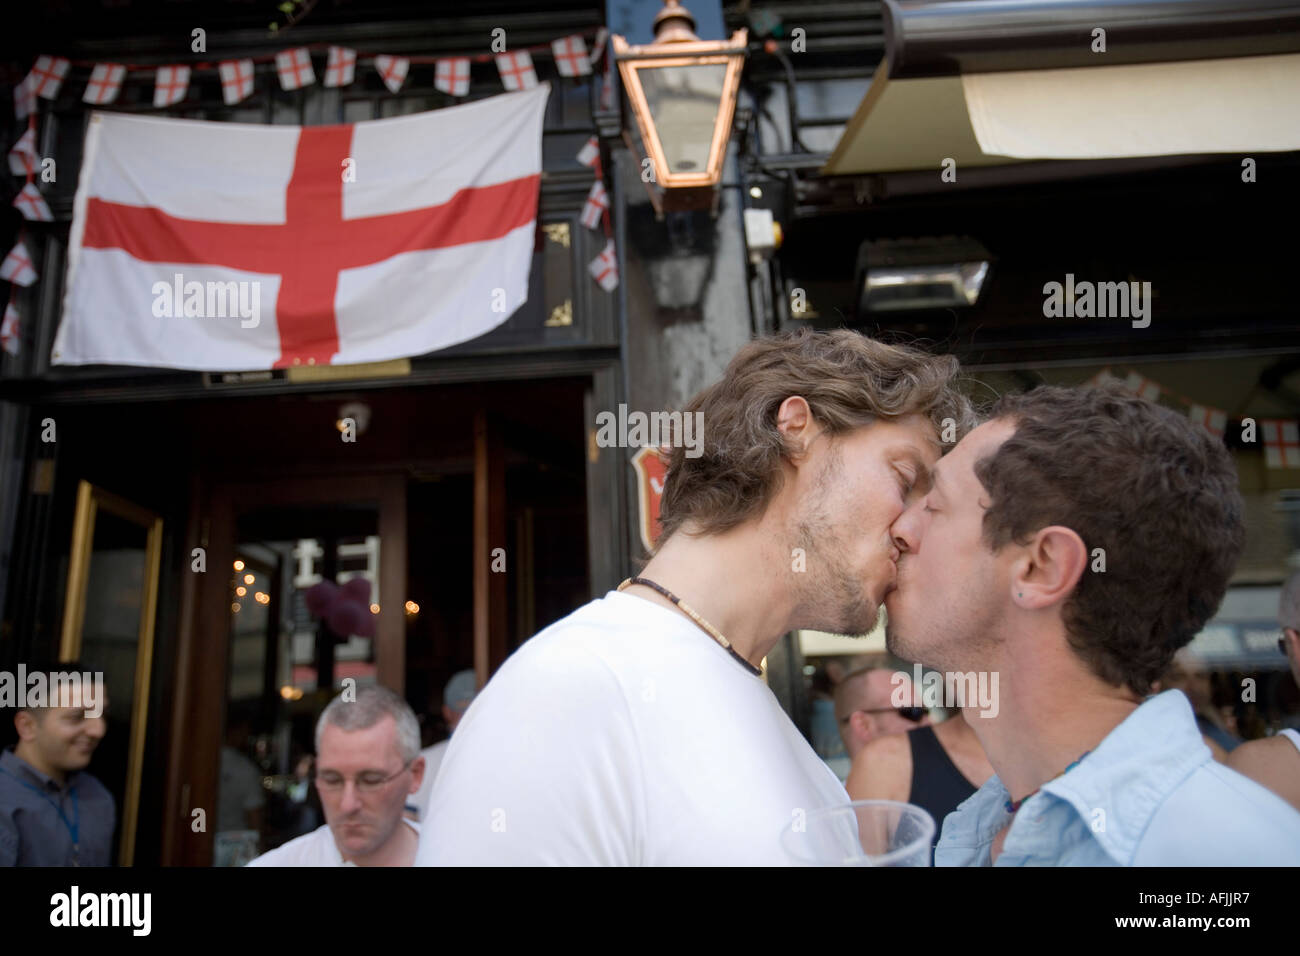 Blonde gay men kiss images